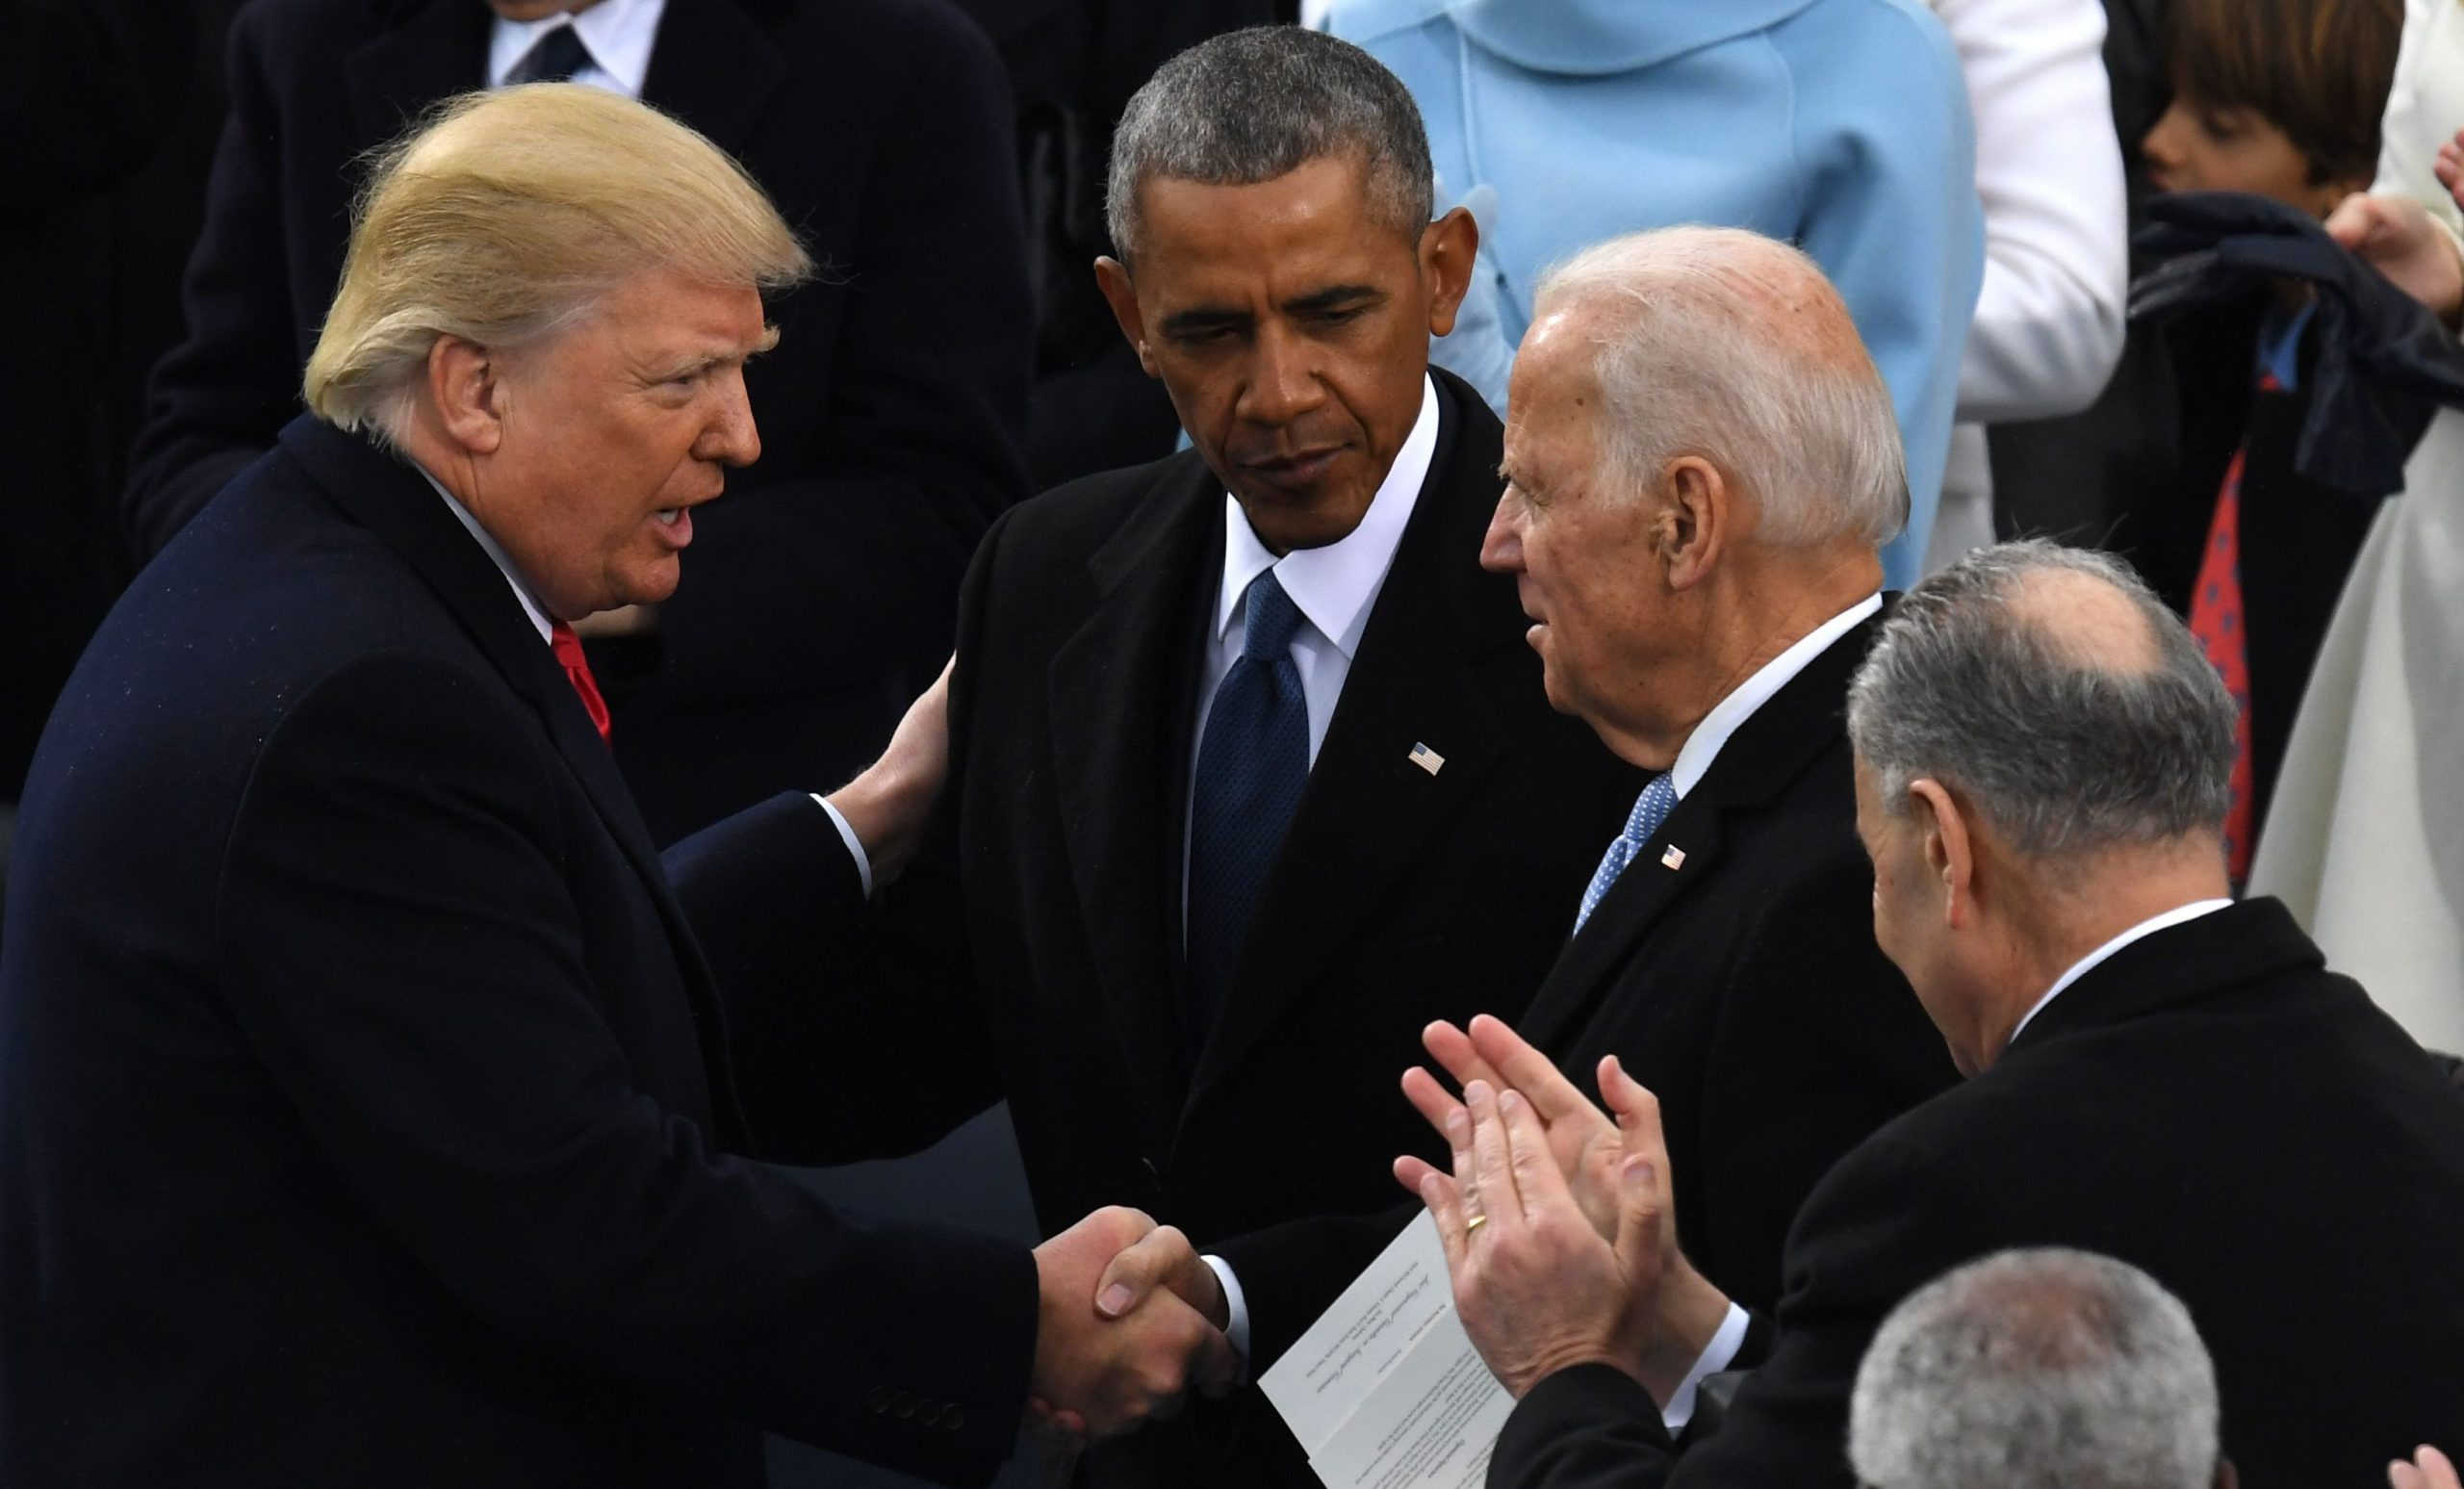 Joe Biden on sexual assault allegation: 'never, never happened'